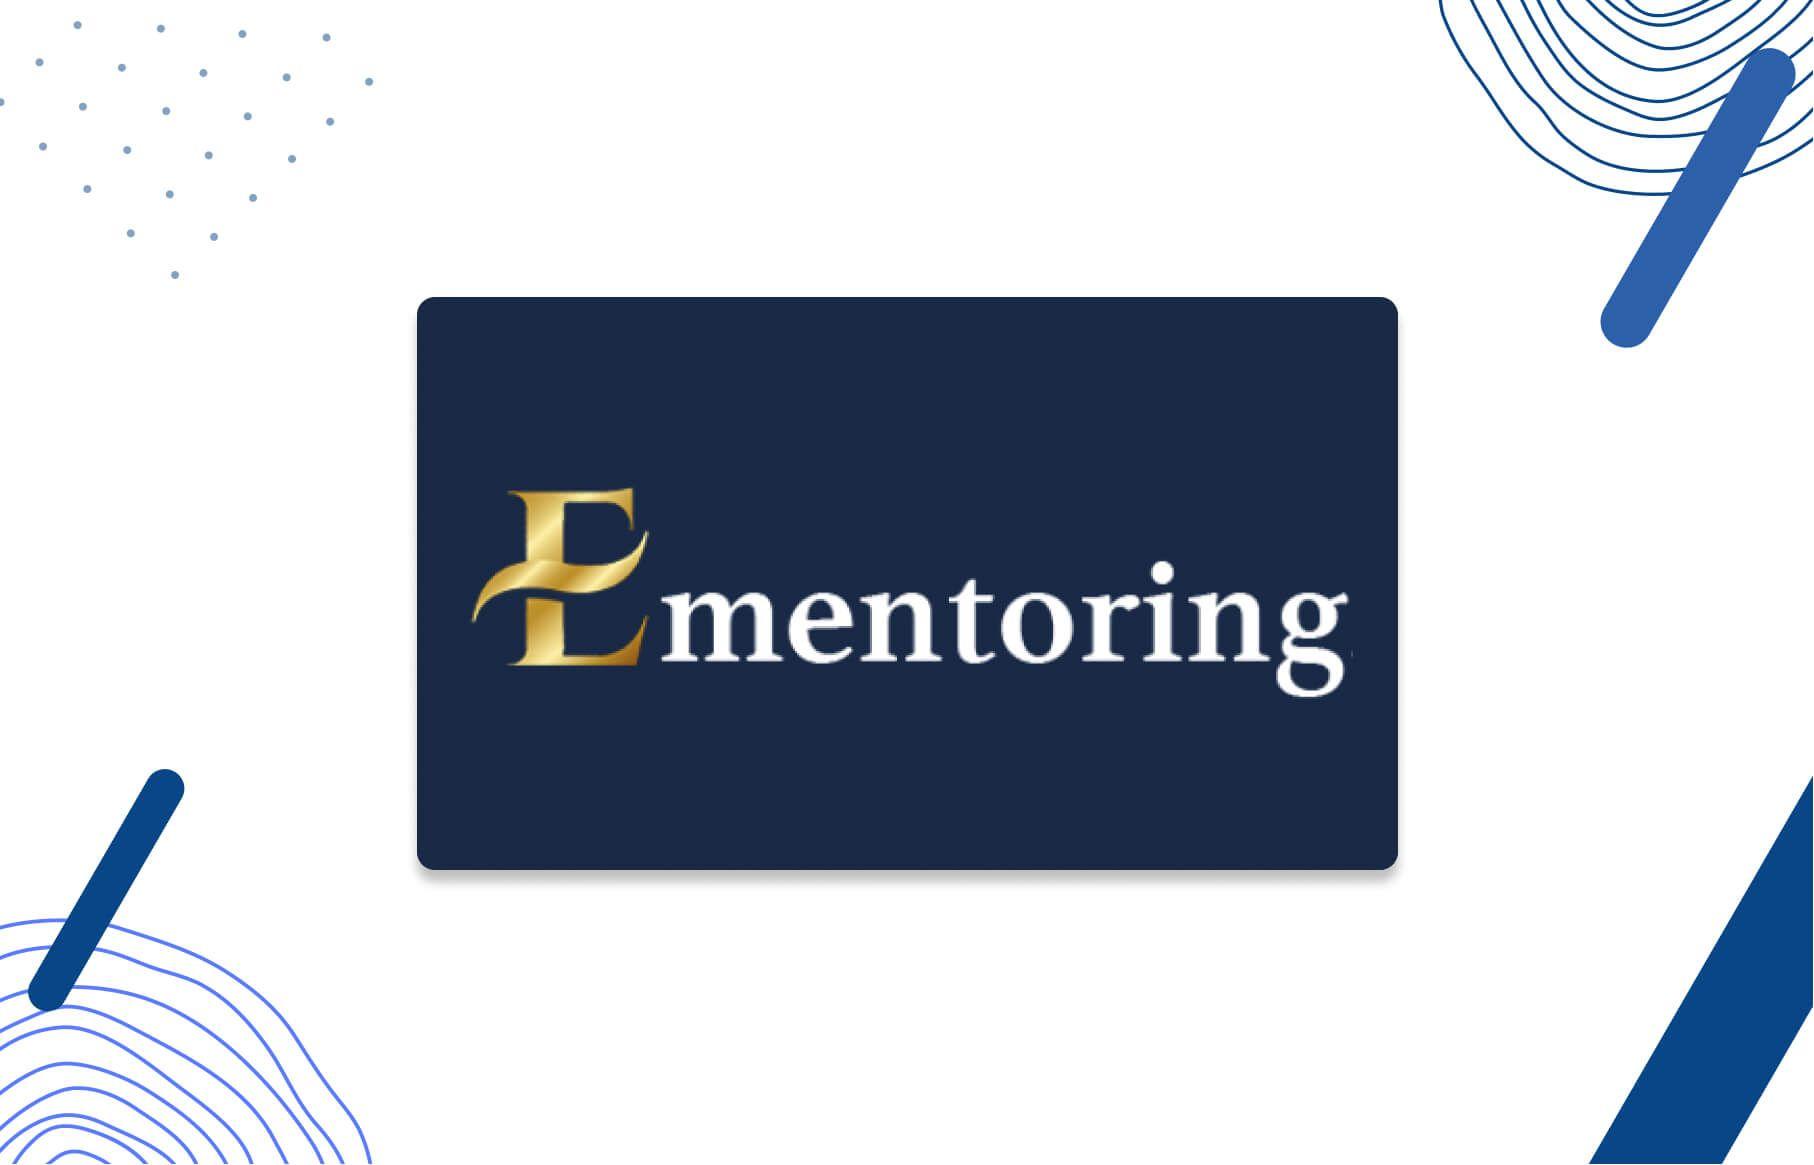 E-mentoring Logo - THE MOST PRESTIGIOUS E-COMMERCE & DROPSHIPPING MENTORING IN 2021